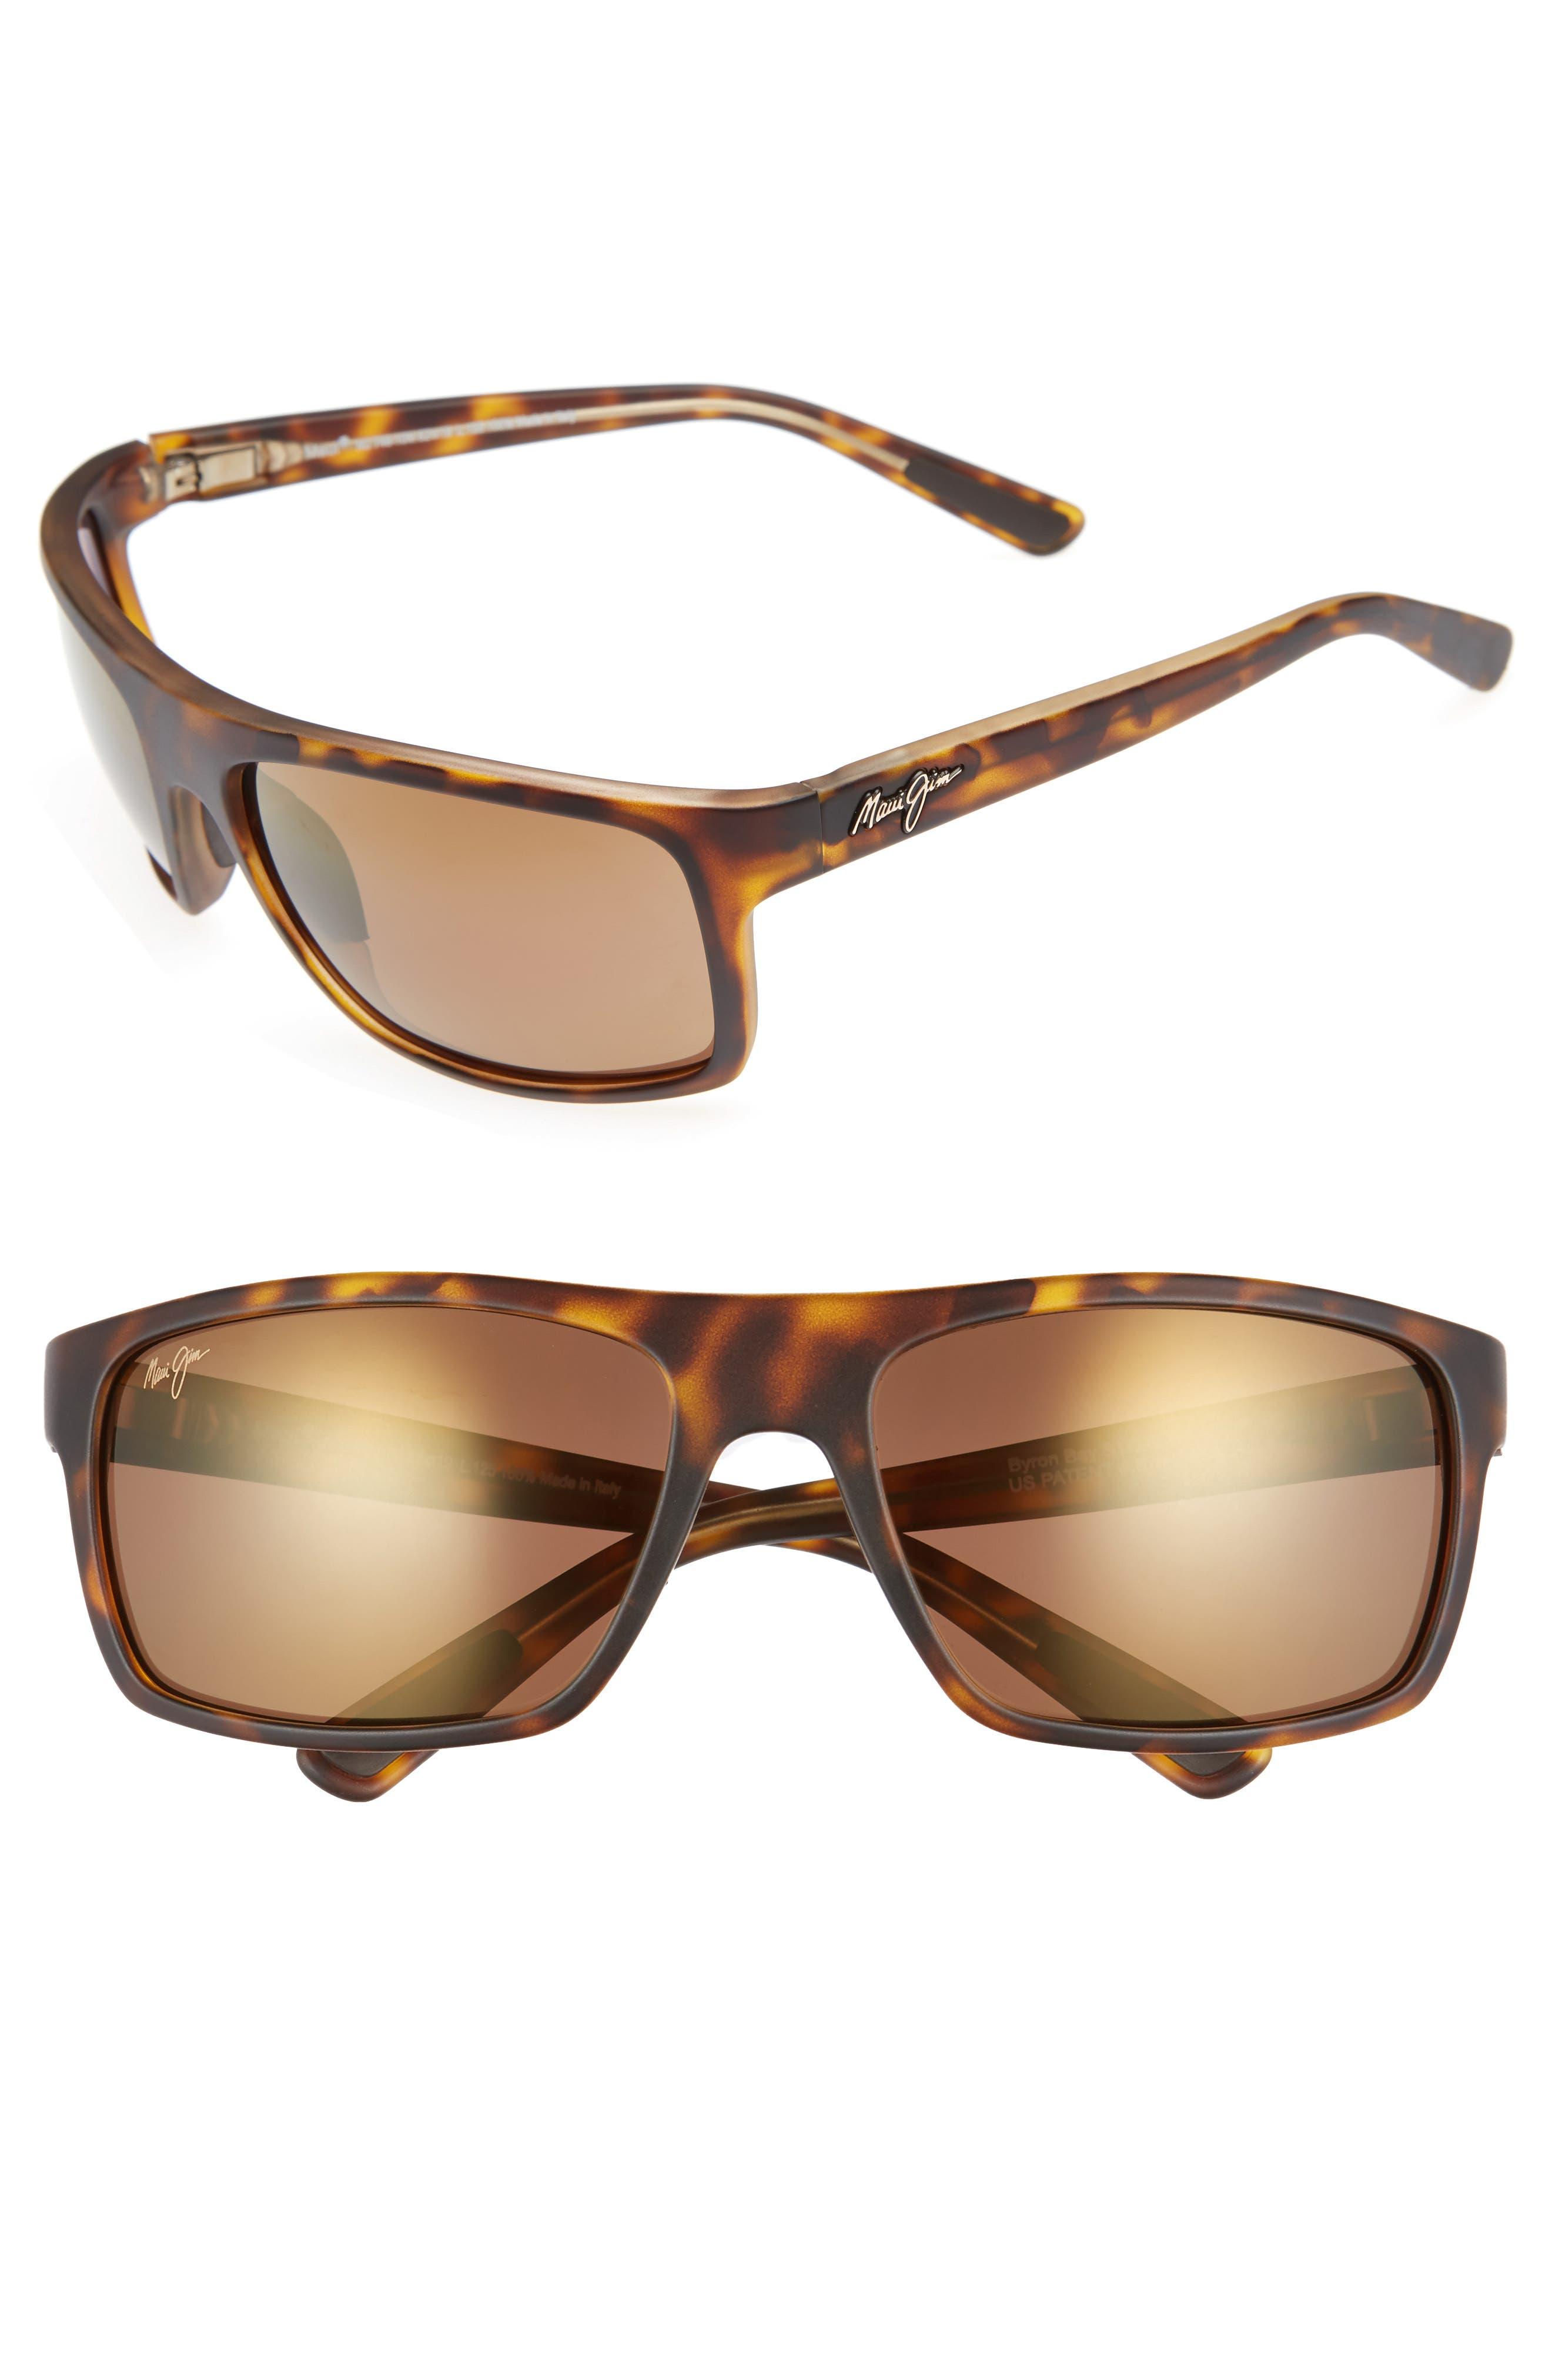 Maui Jim Byron Bay 62Mm Polarized Sunglasses - Matte Tortoise/ Bronze